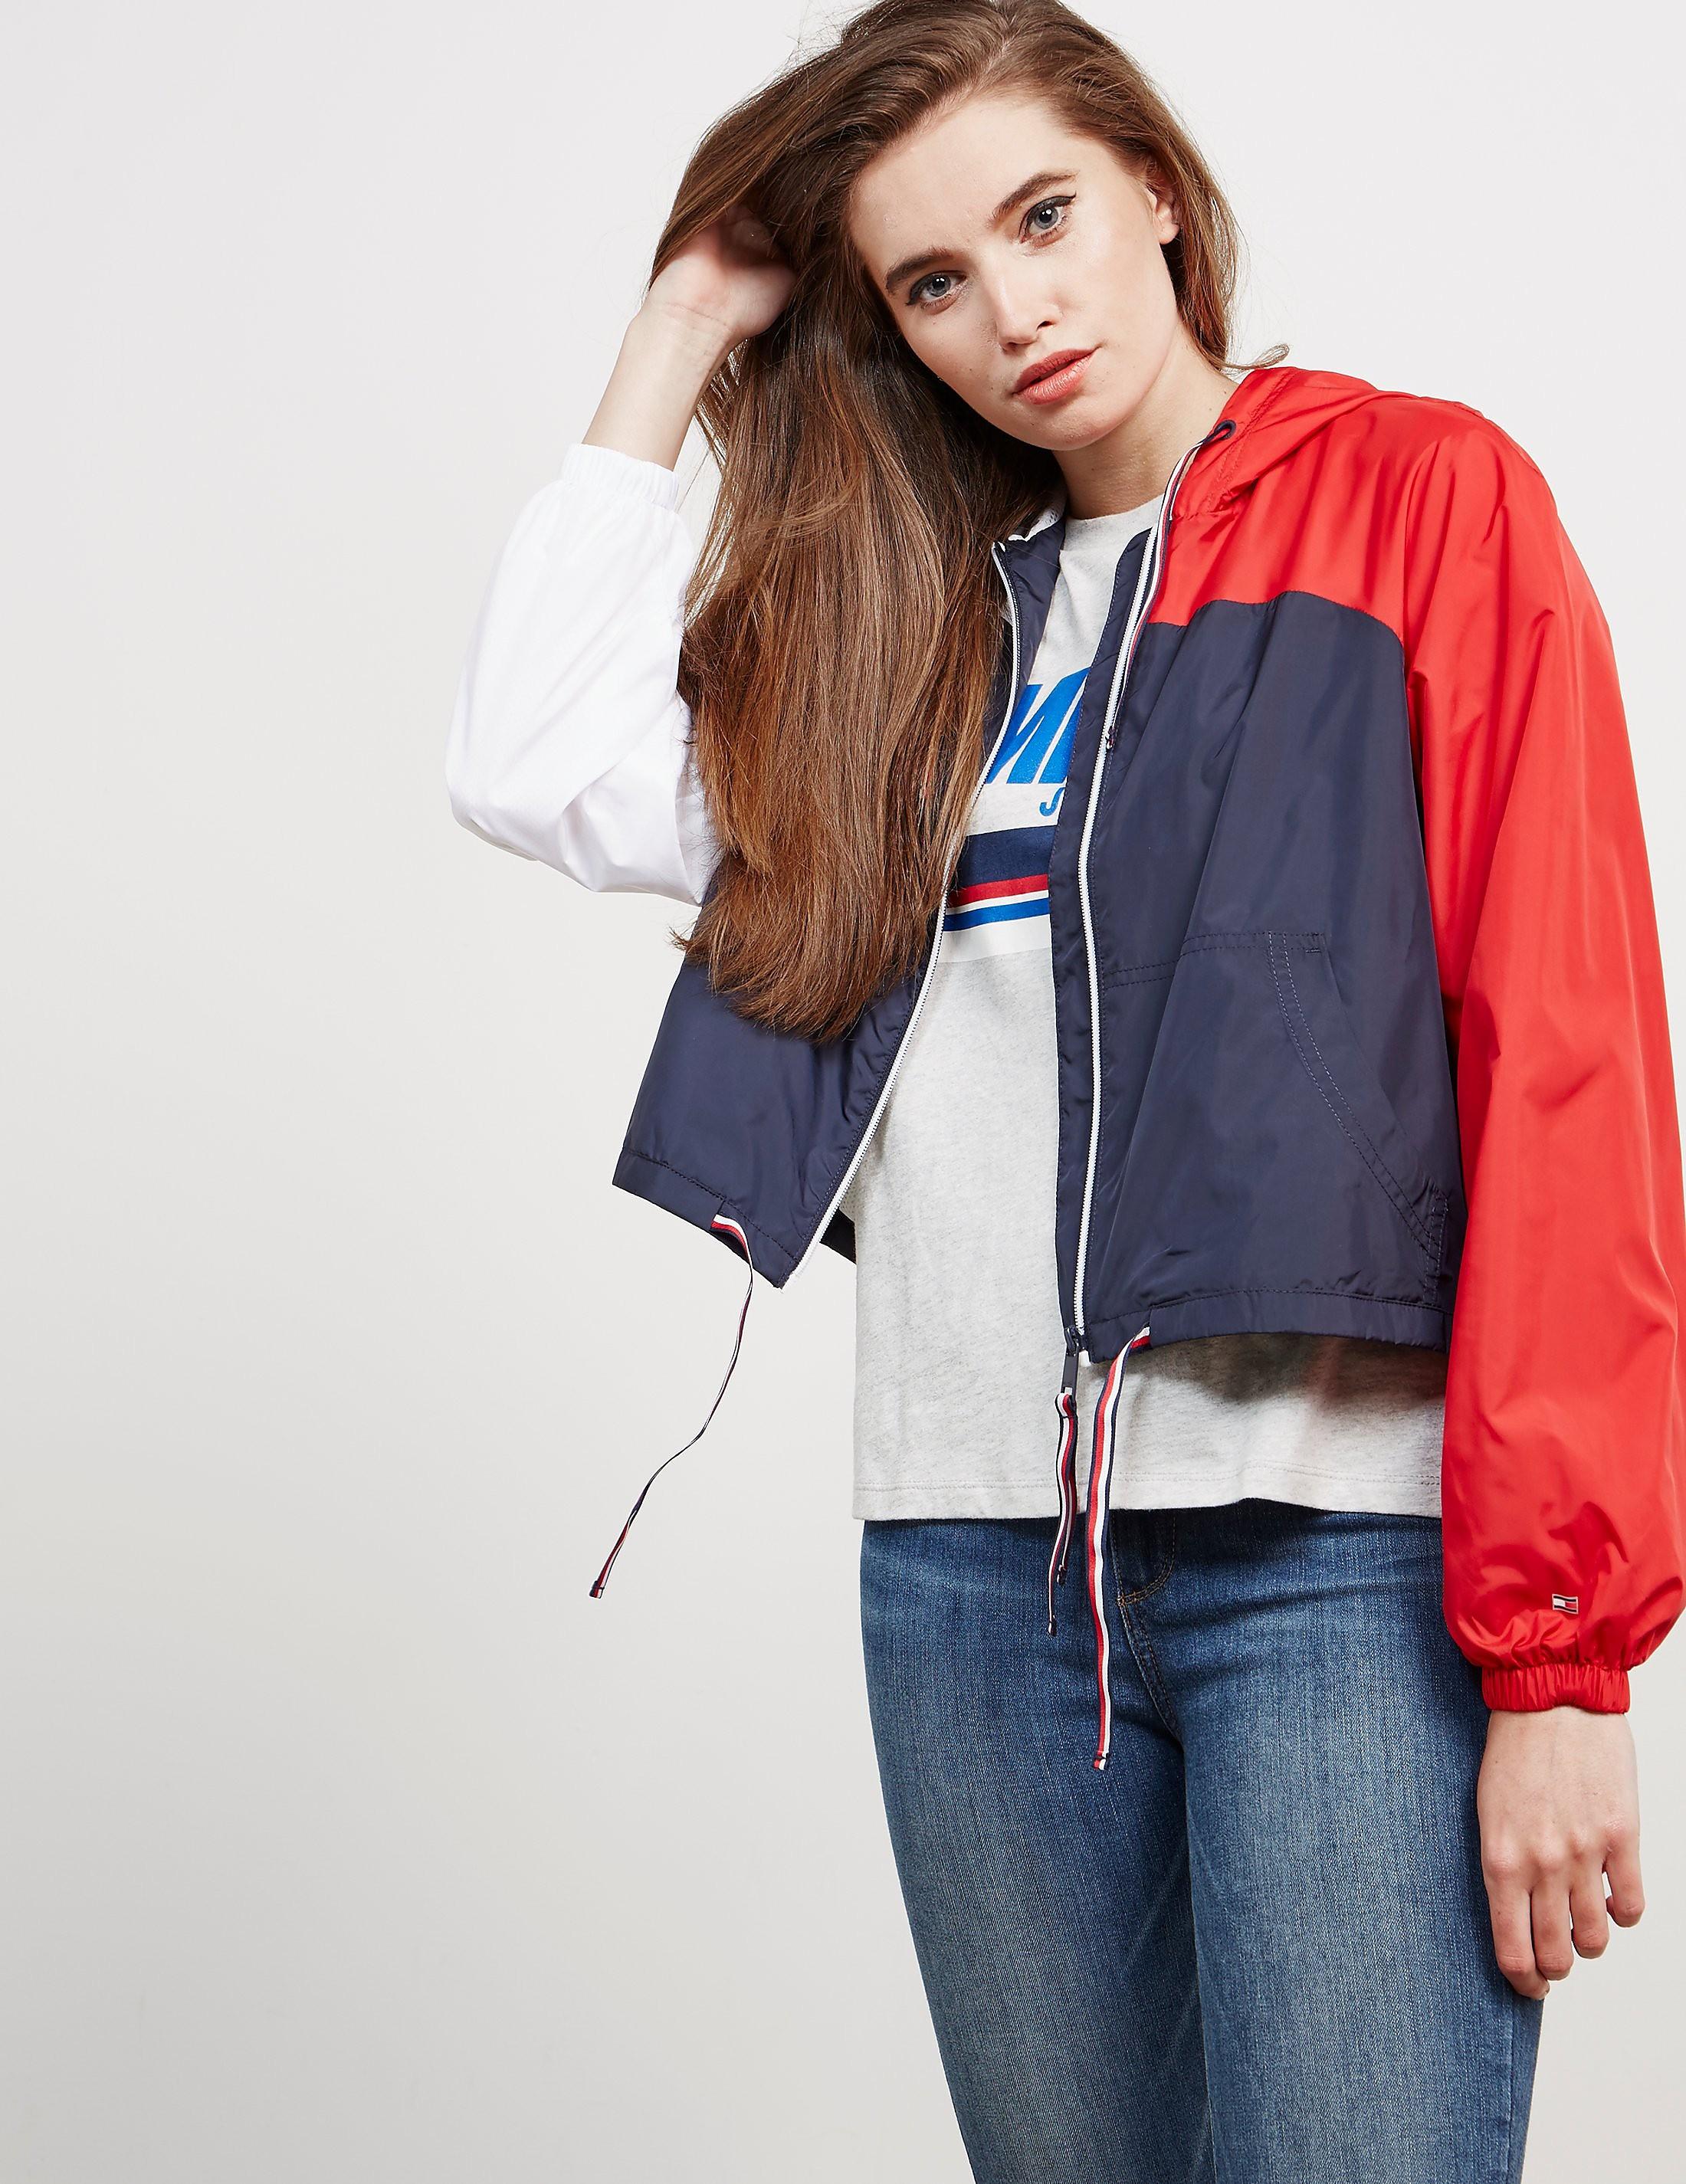 Tommy Hilfiger Athletic Windbreaker Jacket